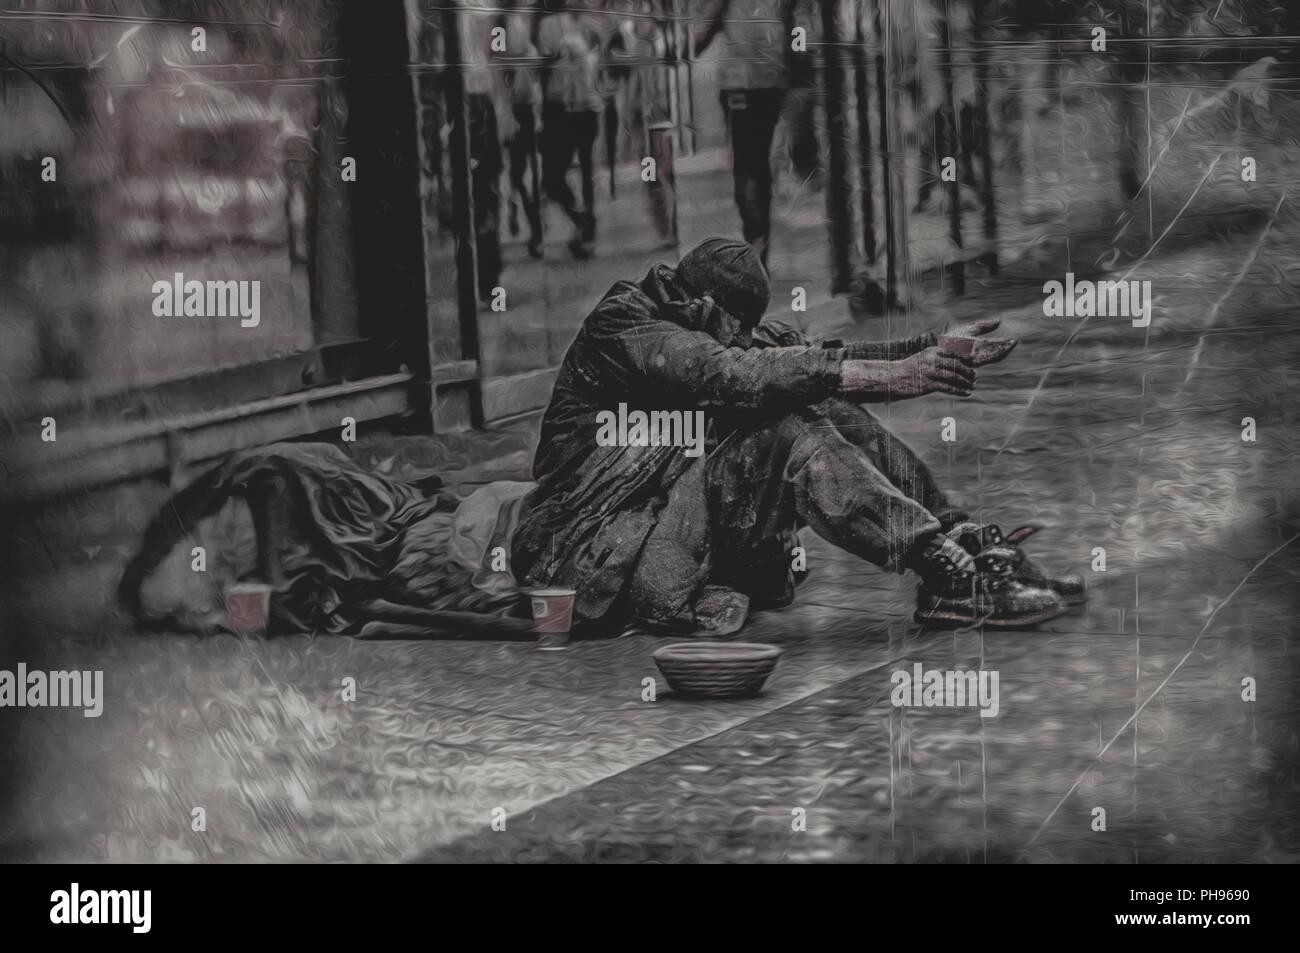 Pobreza Imagen De Stock